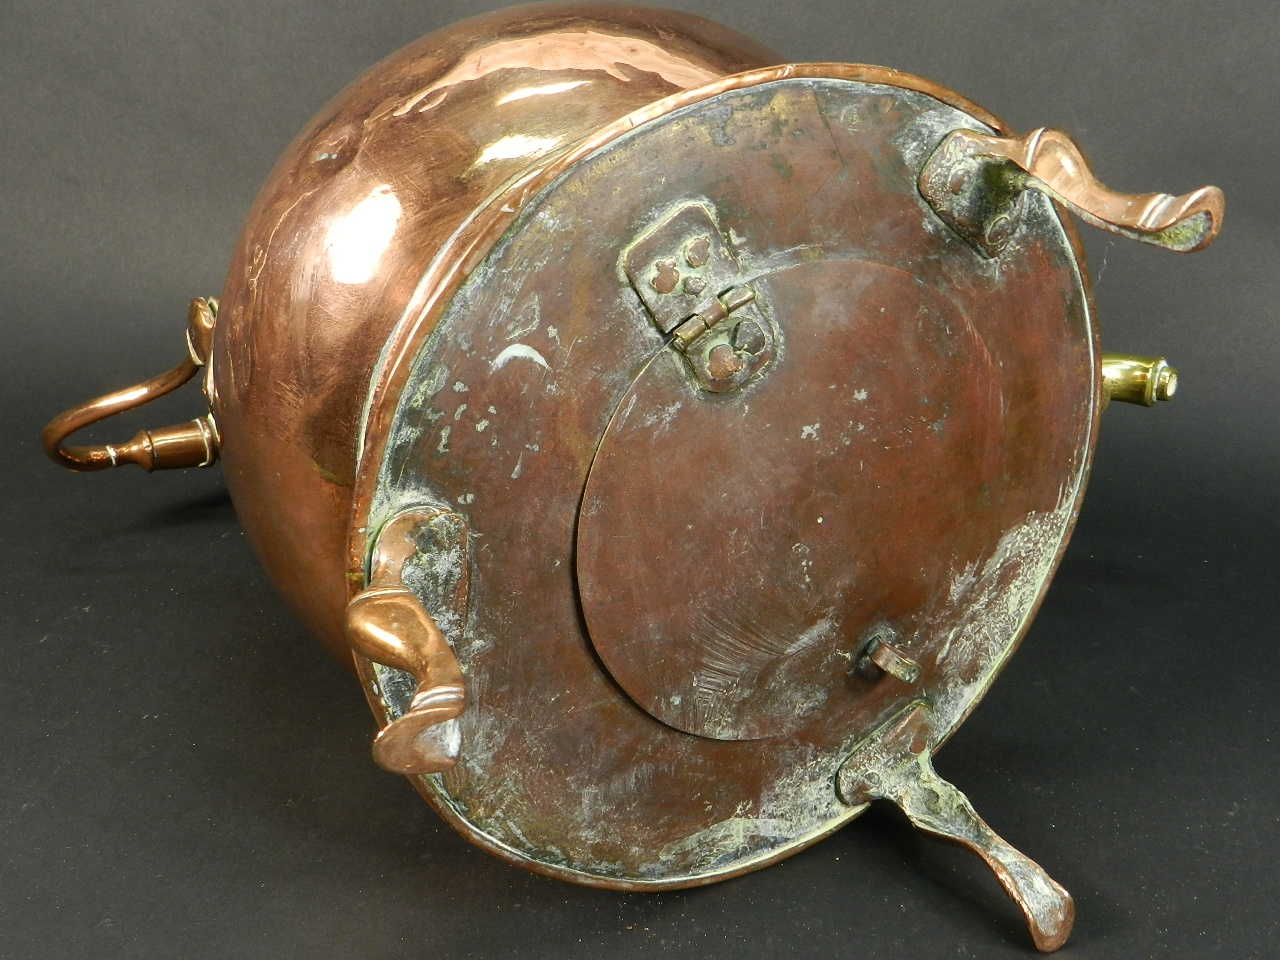 Imagen SAMOVAR DE COBRE AÑO 1900 40813